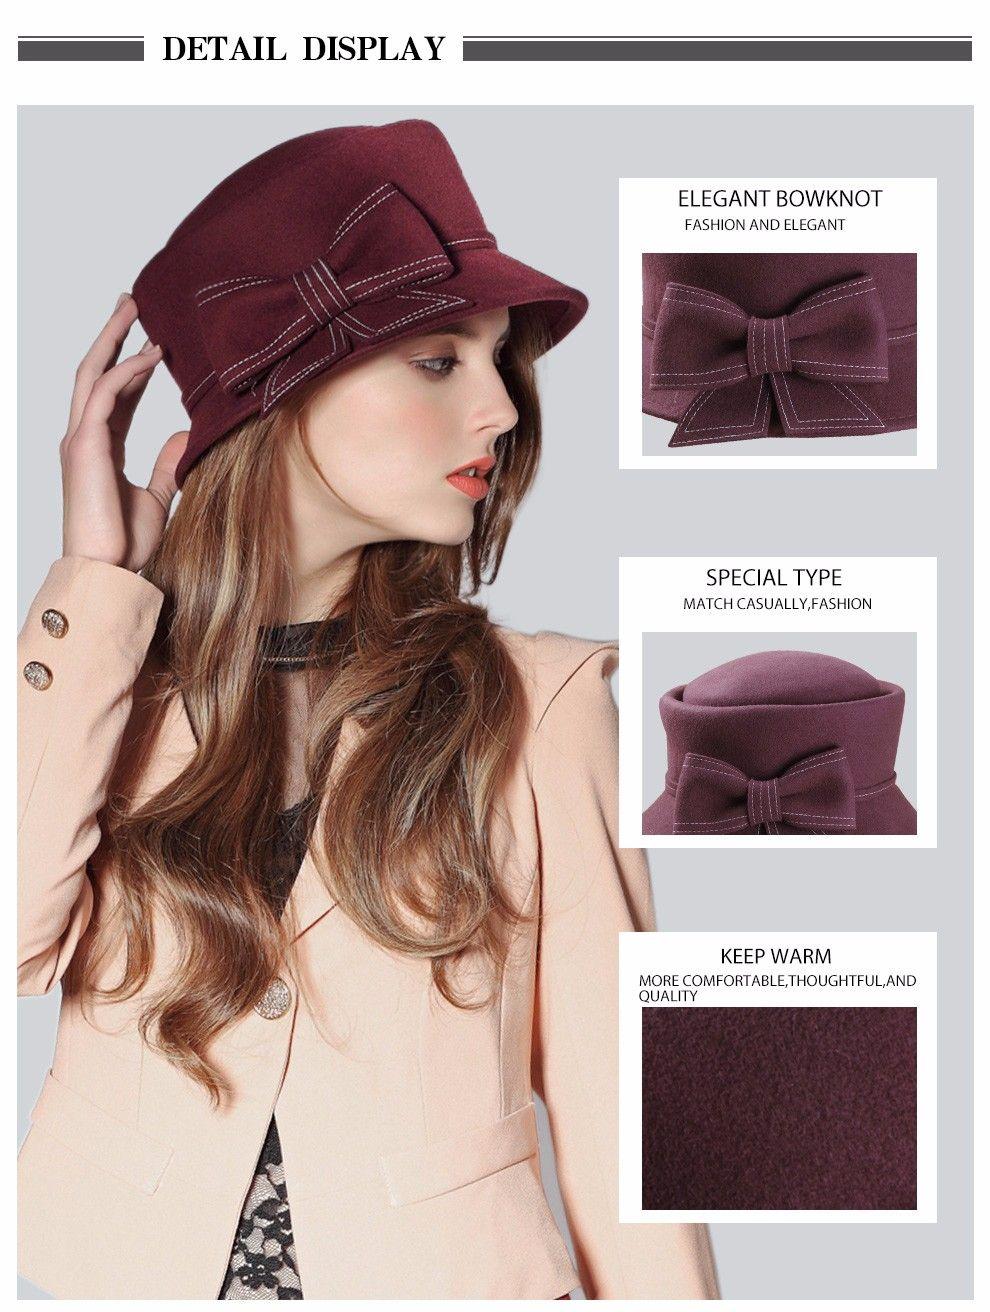 97497f42c155f 100% Australian Wool Fedora Hat bowknot Noble Bowler Hats For Women Wide  Brim Formal Church Cloche Hat FW149001B